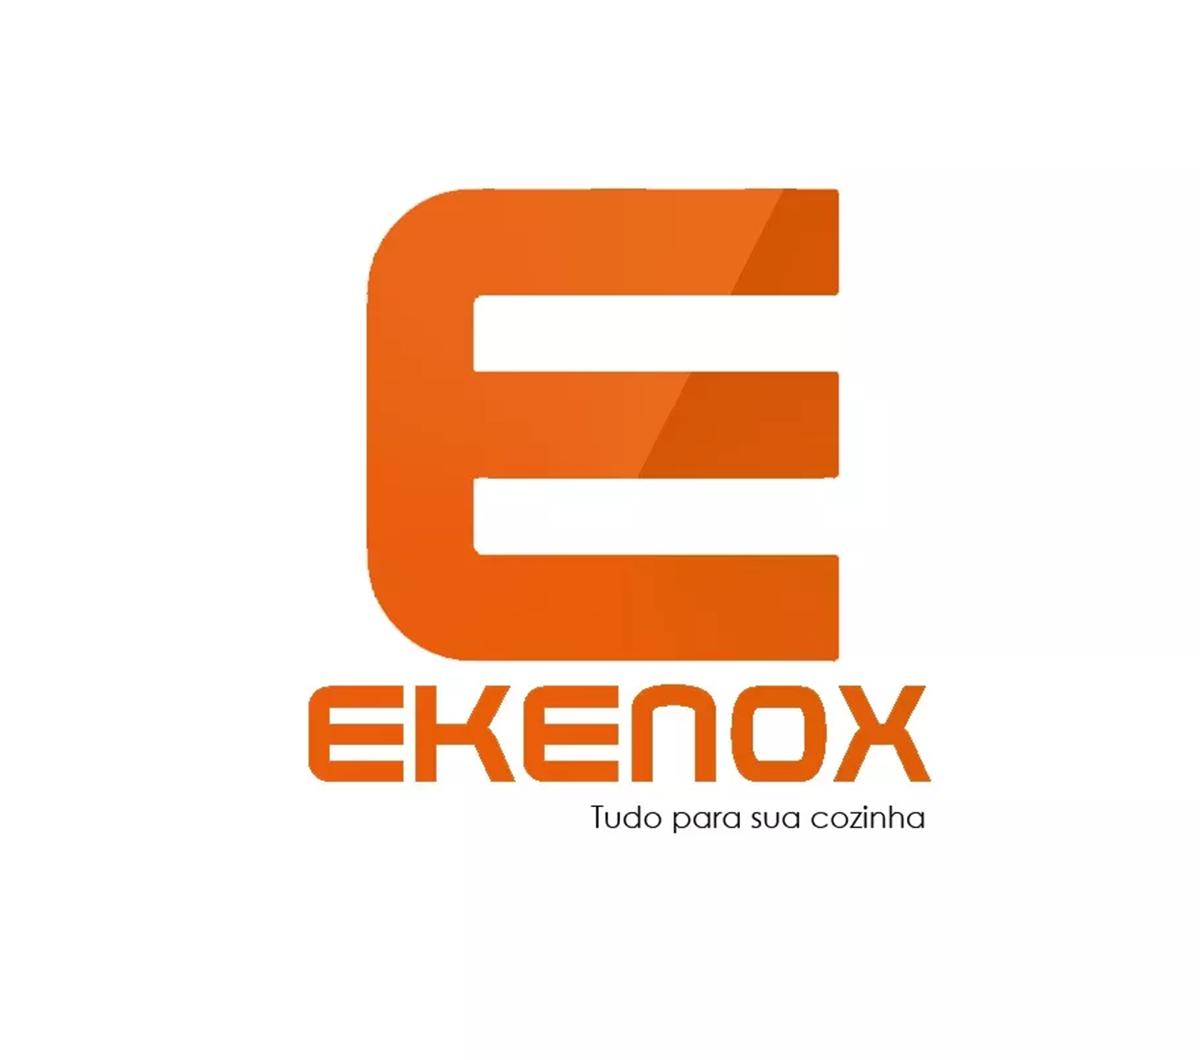 Conservador de Batata 1 Cuba Ekenox  - EKENOX- Equipamentos Industriais